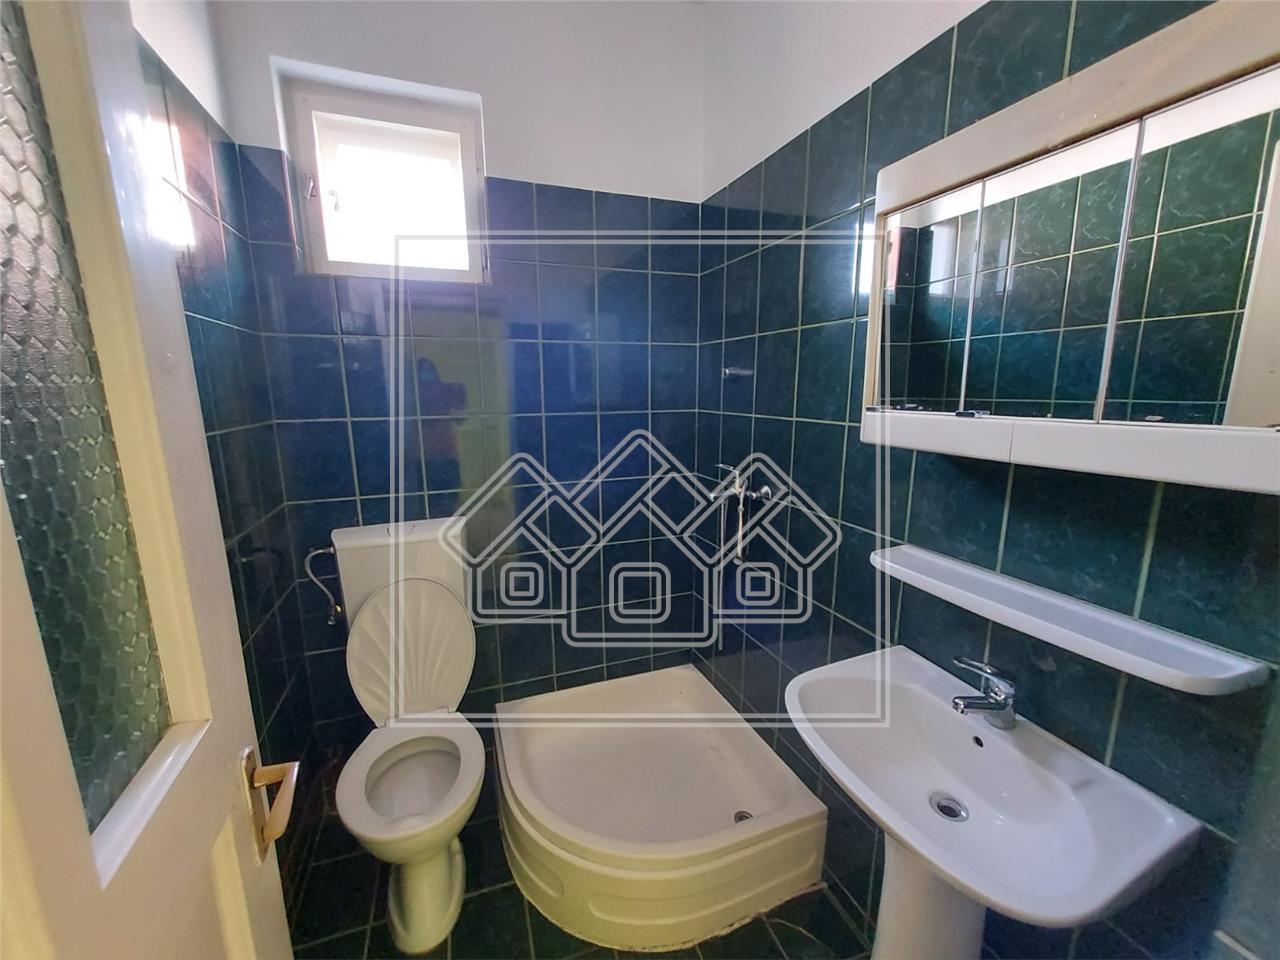 Casa de inchiriat in Sibiu 2 camere 2 bai terasa de 35mp  pivnita